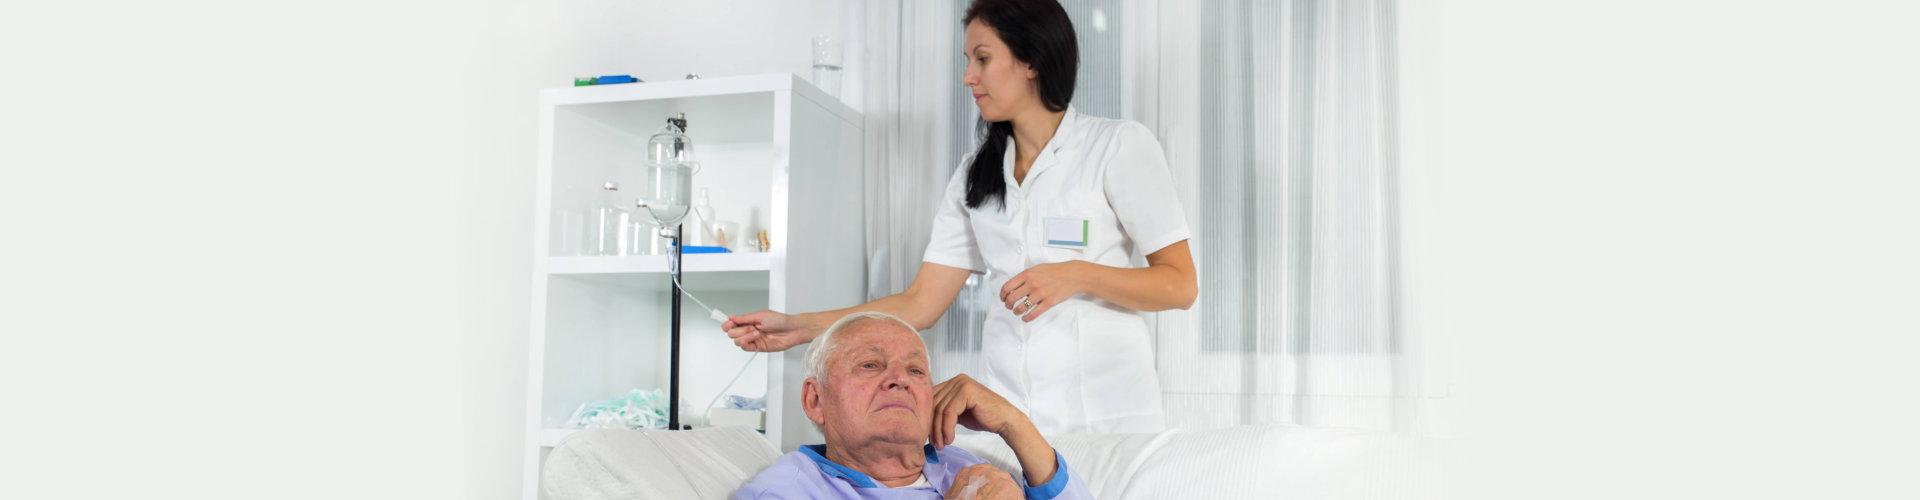 older men receives infusion in hospital